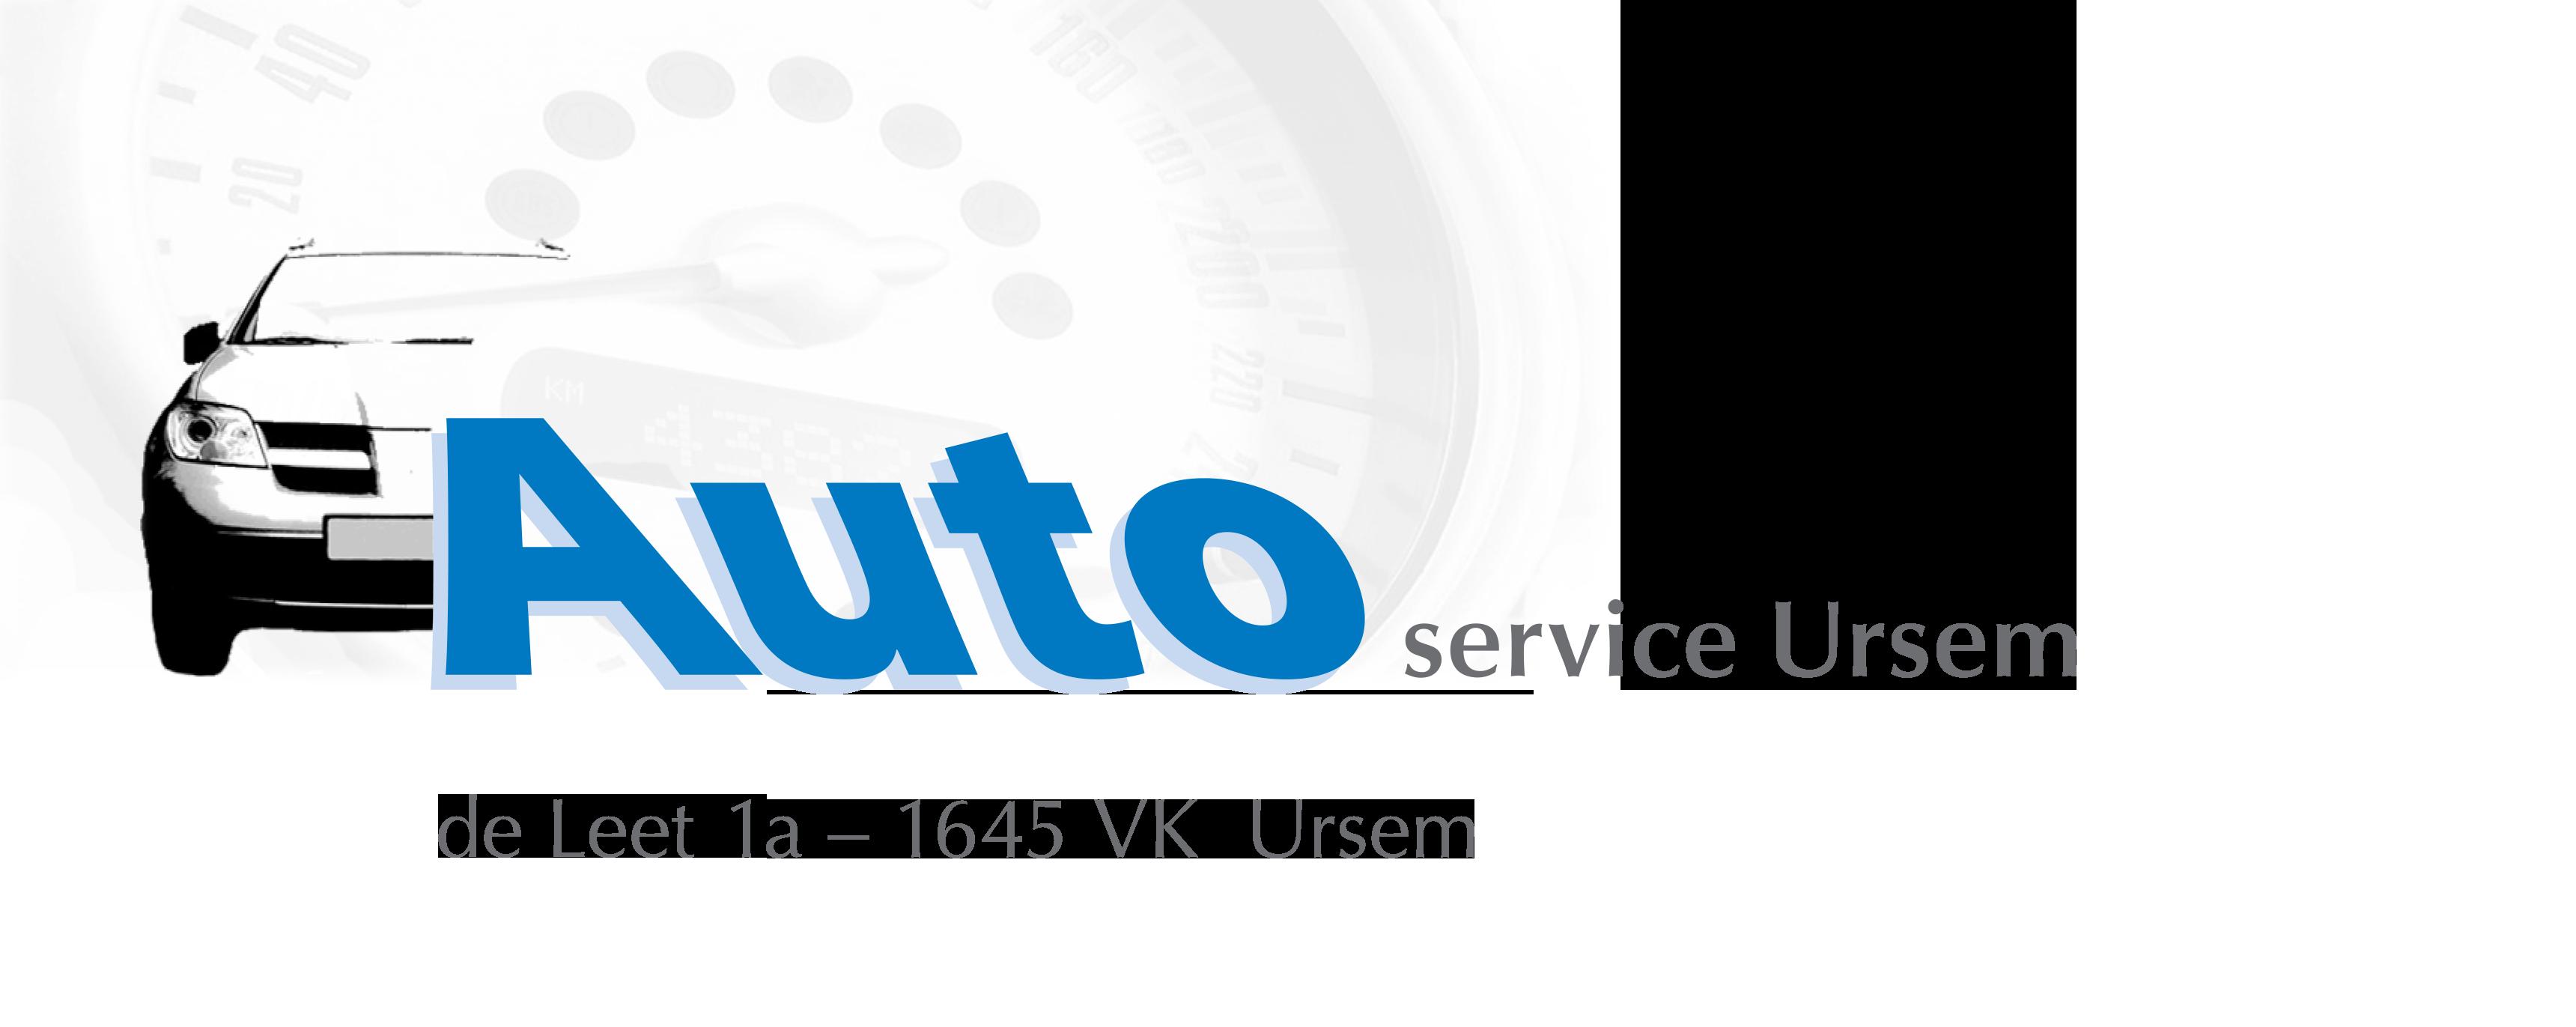 autoservice-ursem-6e88d4de88e0869cae5393f0aabb1b2c.png